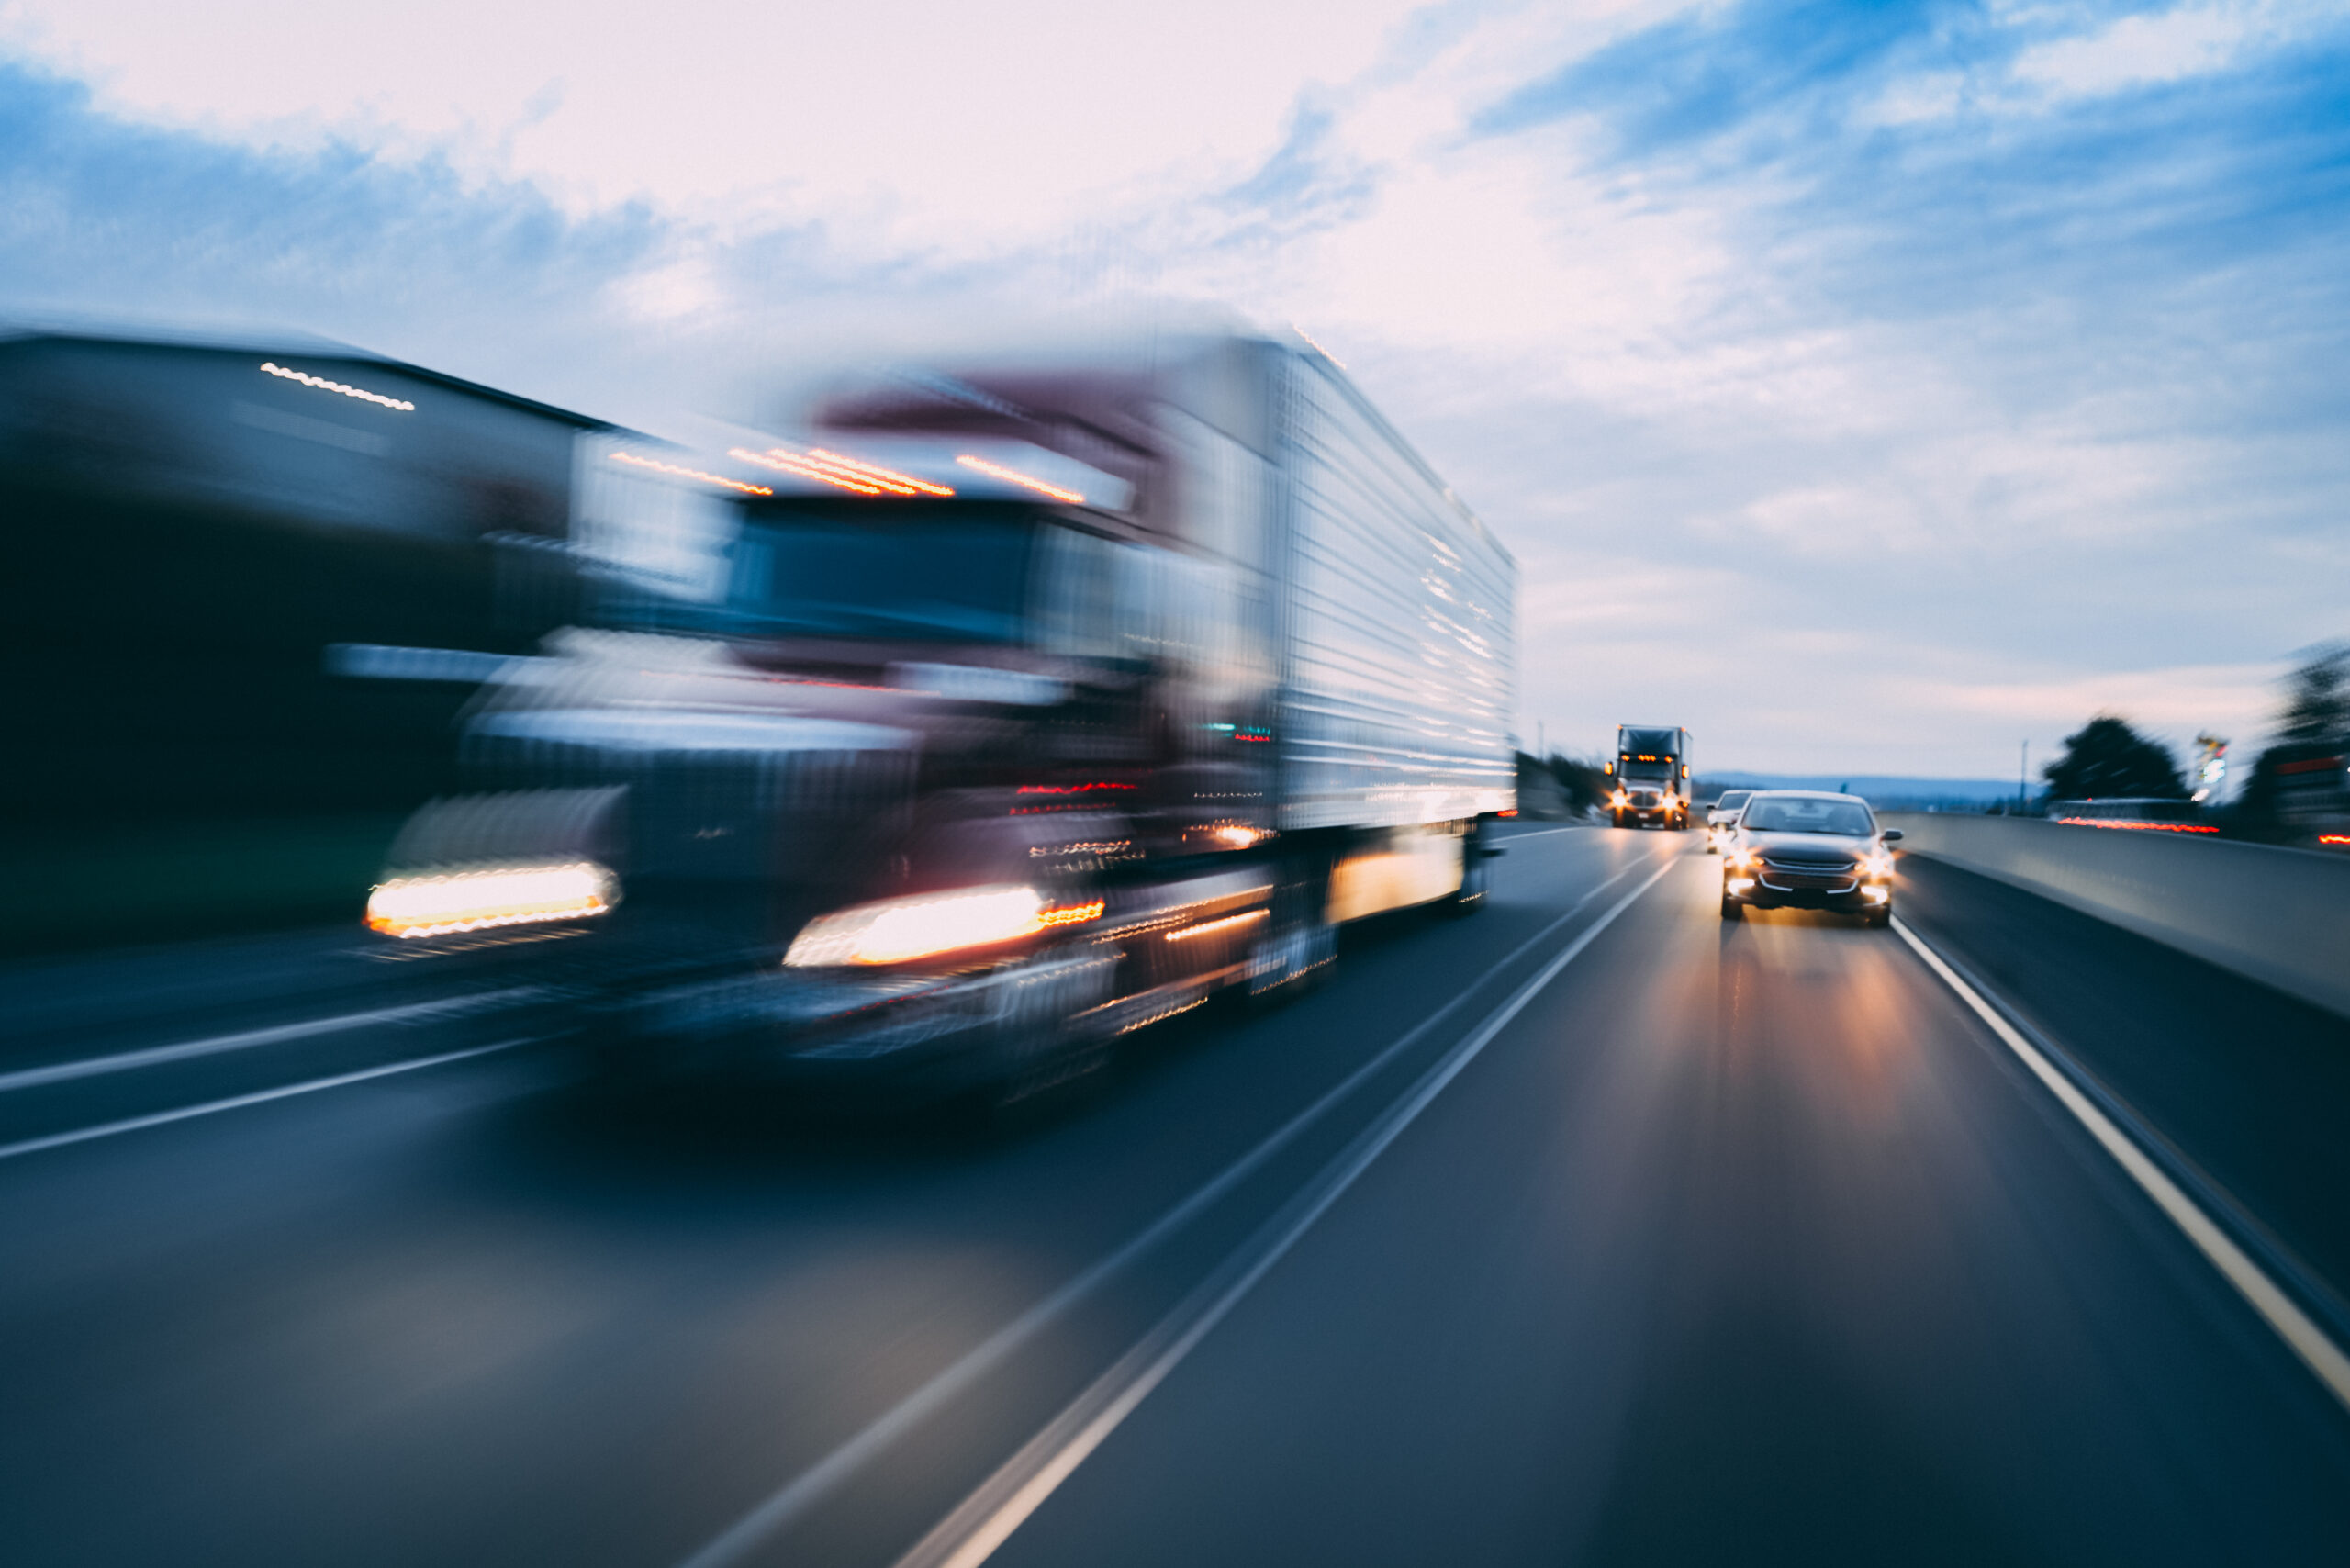 Big rig 18-wheeler semi-truck motion blur transportation concept